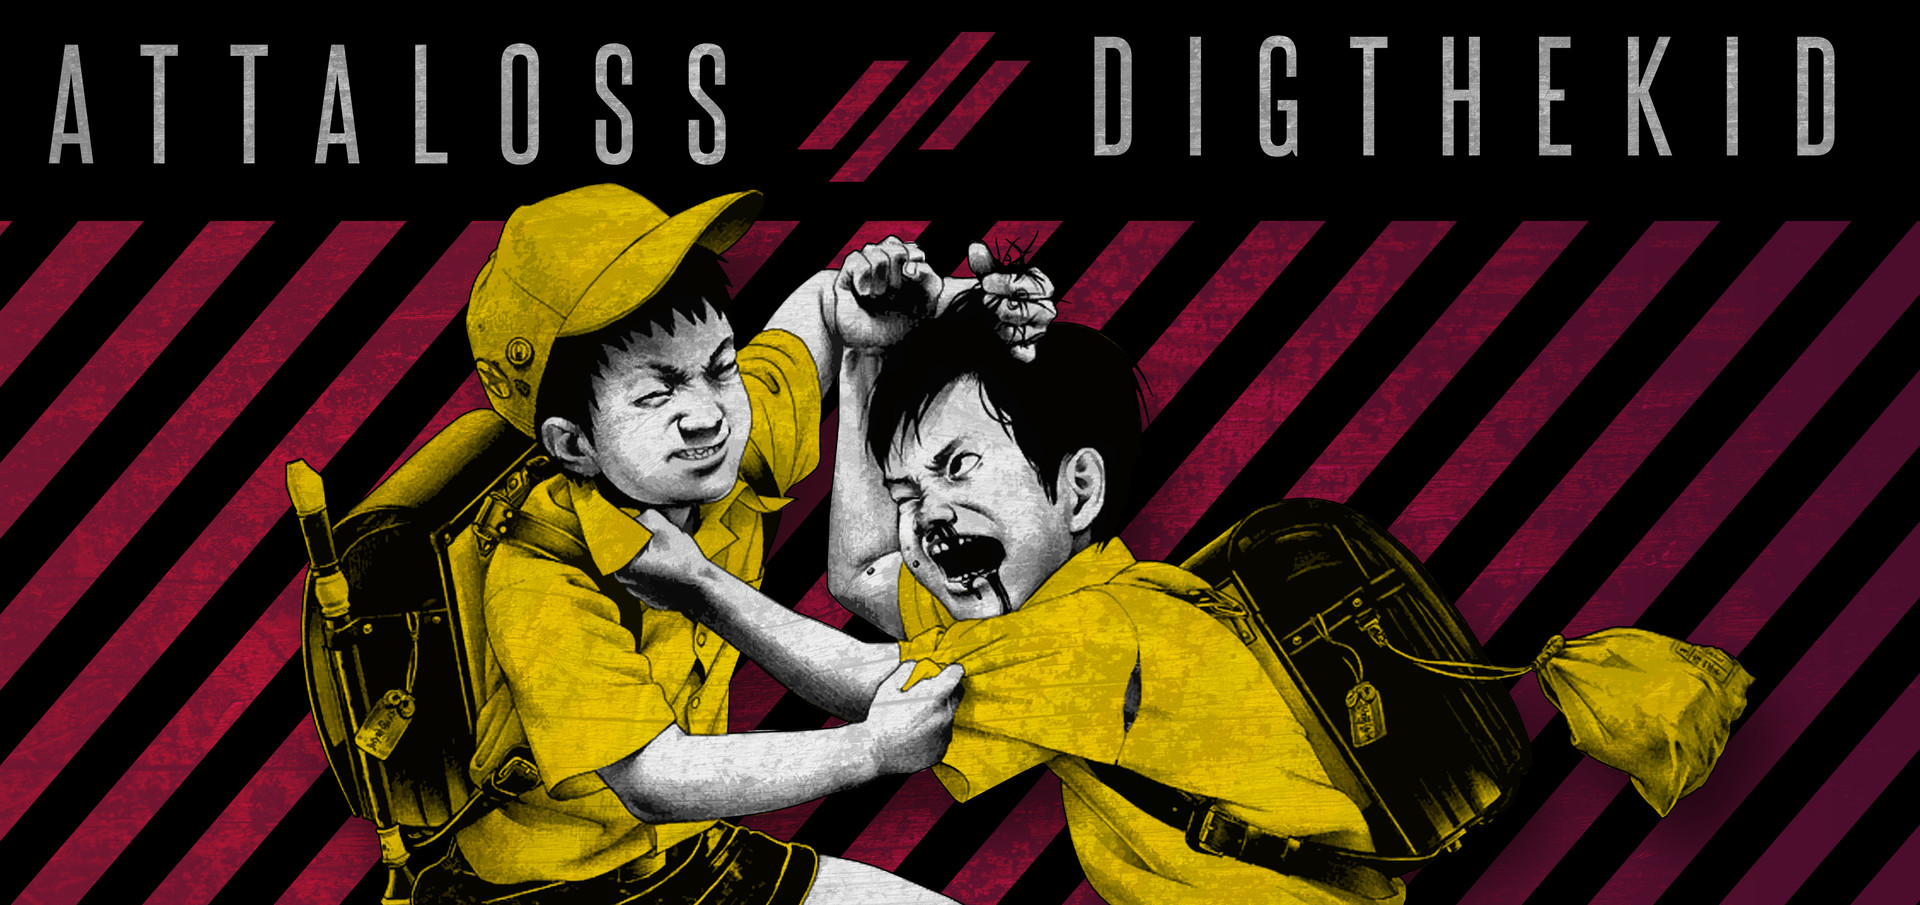 ATALOSS vs DIG THE KID